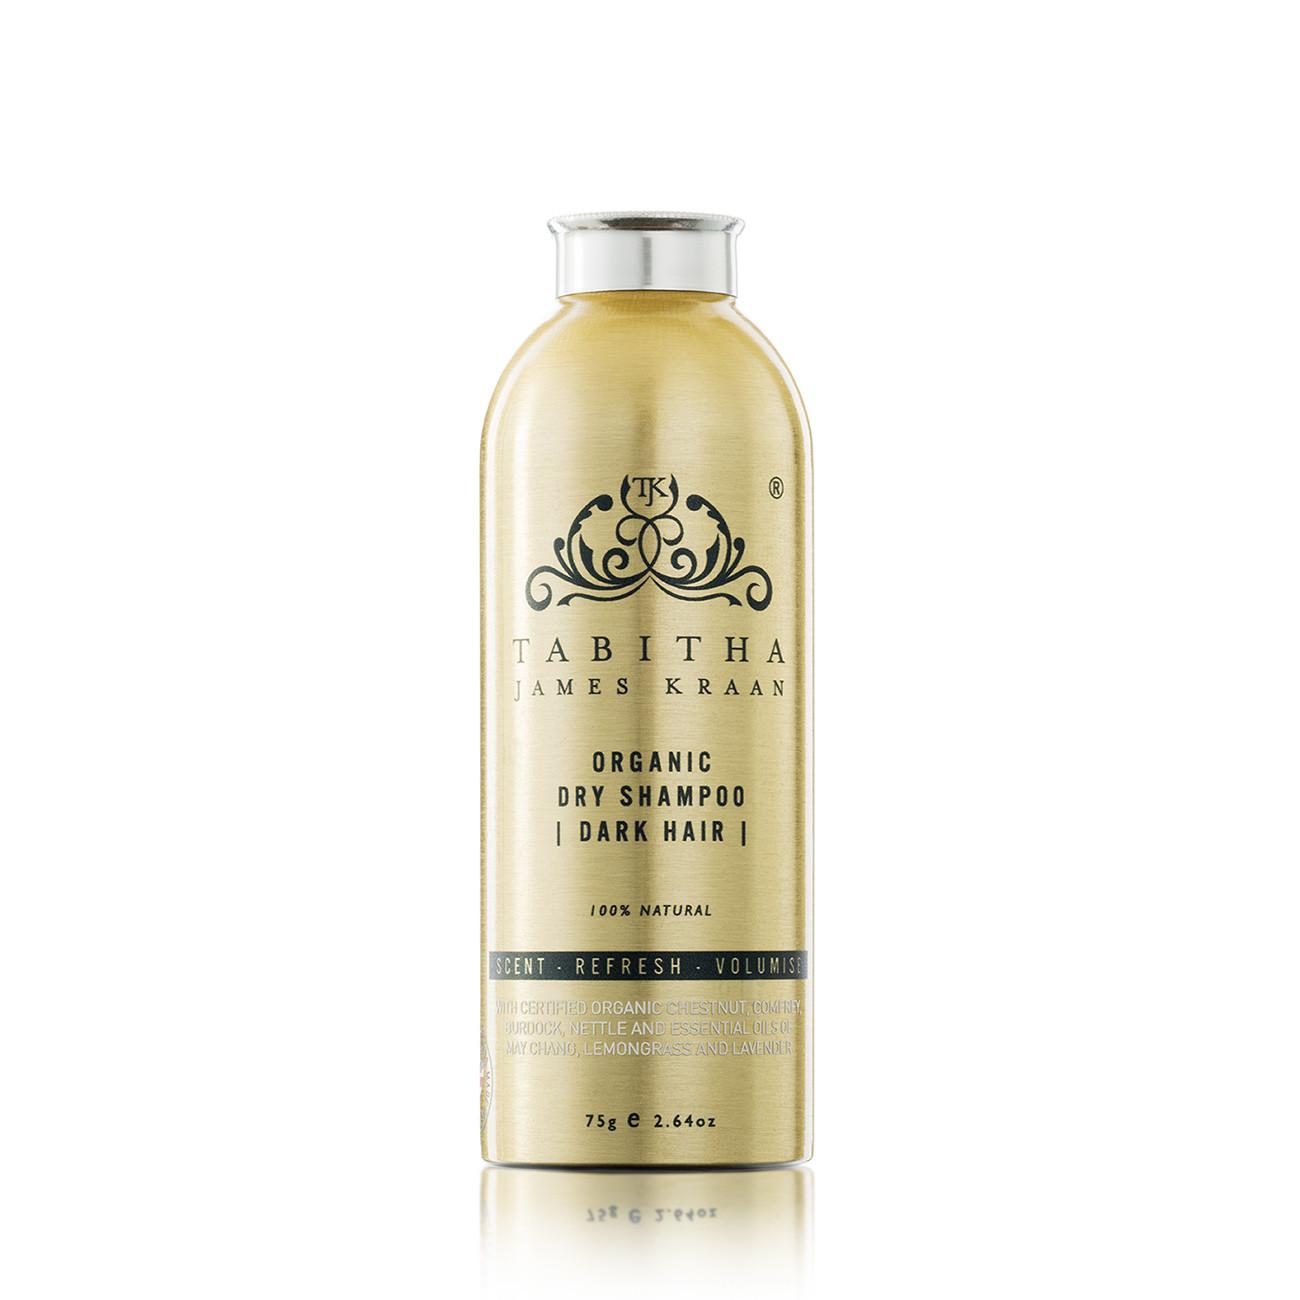 Tabitha James Kraan Dry Shampoo For Dark Hair Eluxe